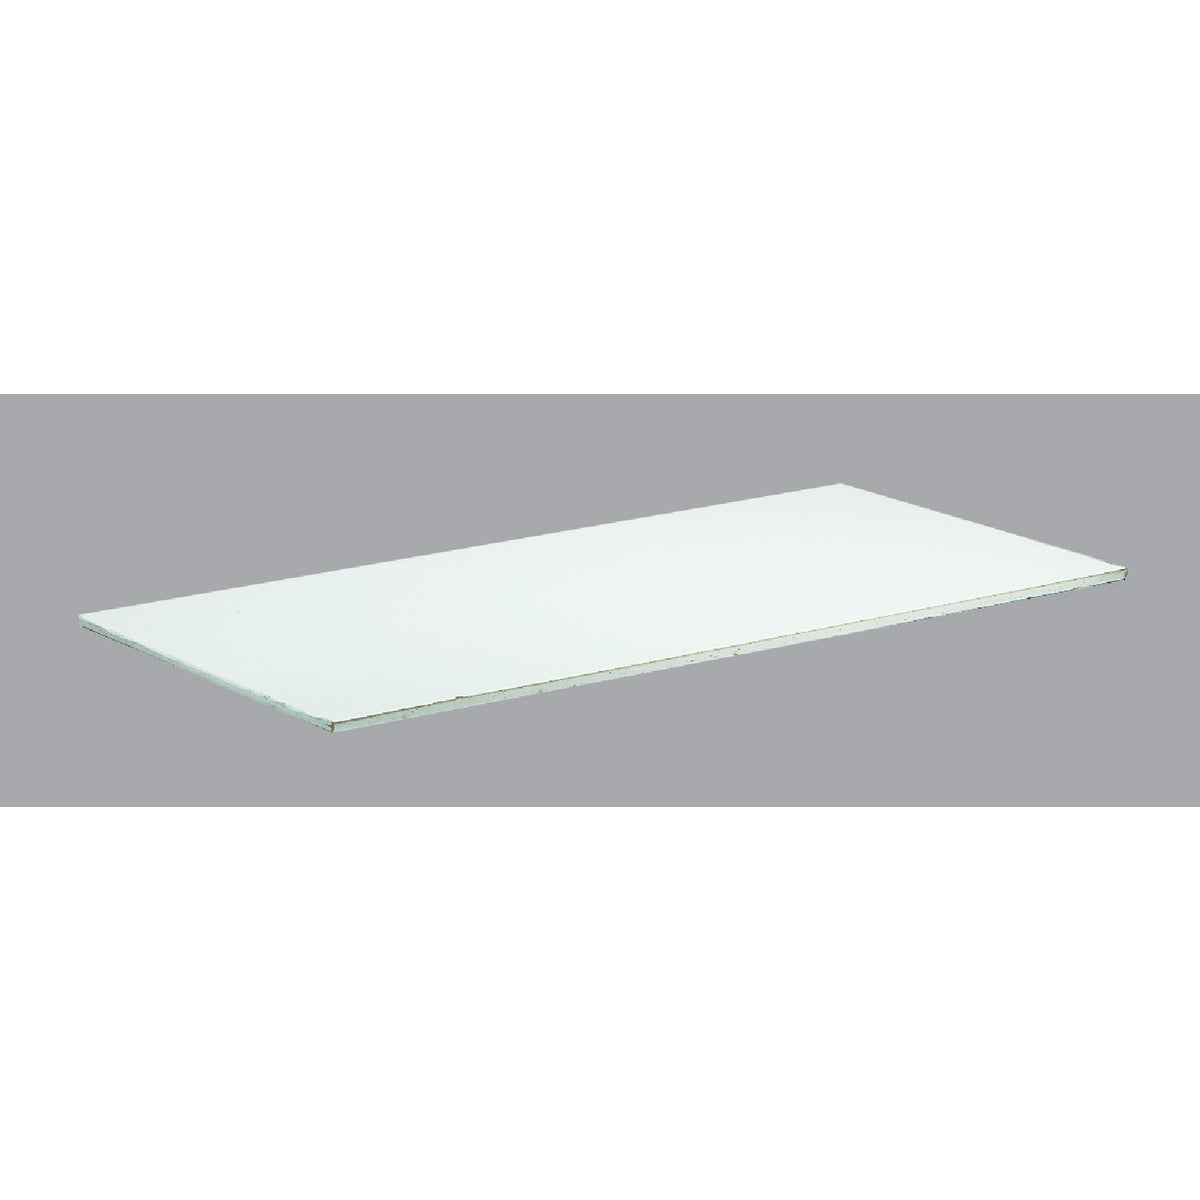 sheetrock climaplus 2 ft x 4 ft white